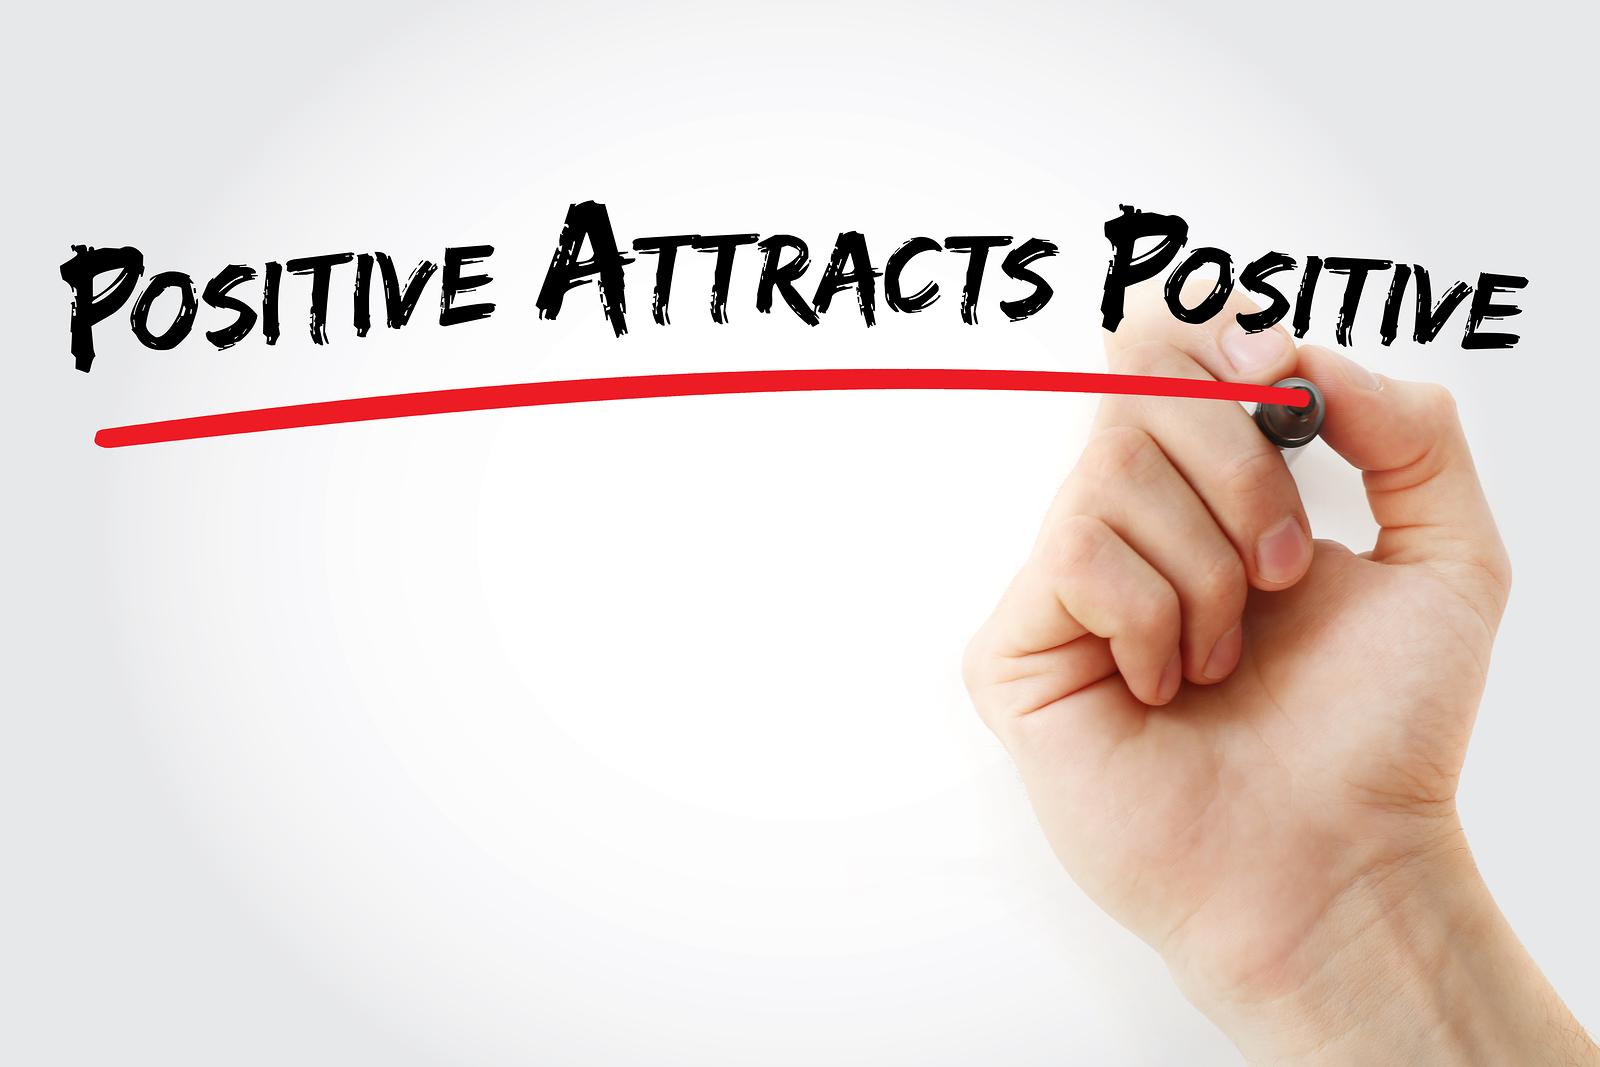 bigstock-Hand-Writing-Positive-Attracts-137444636.jpg